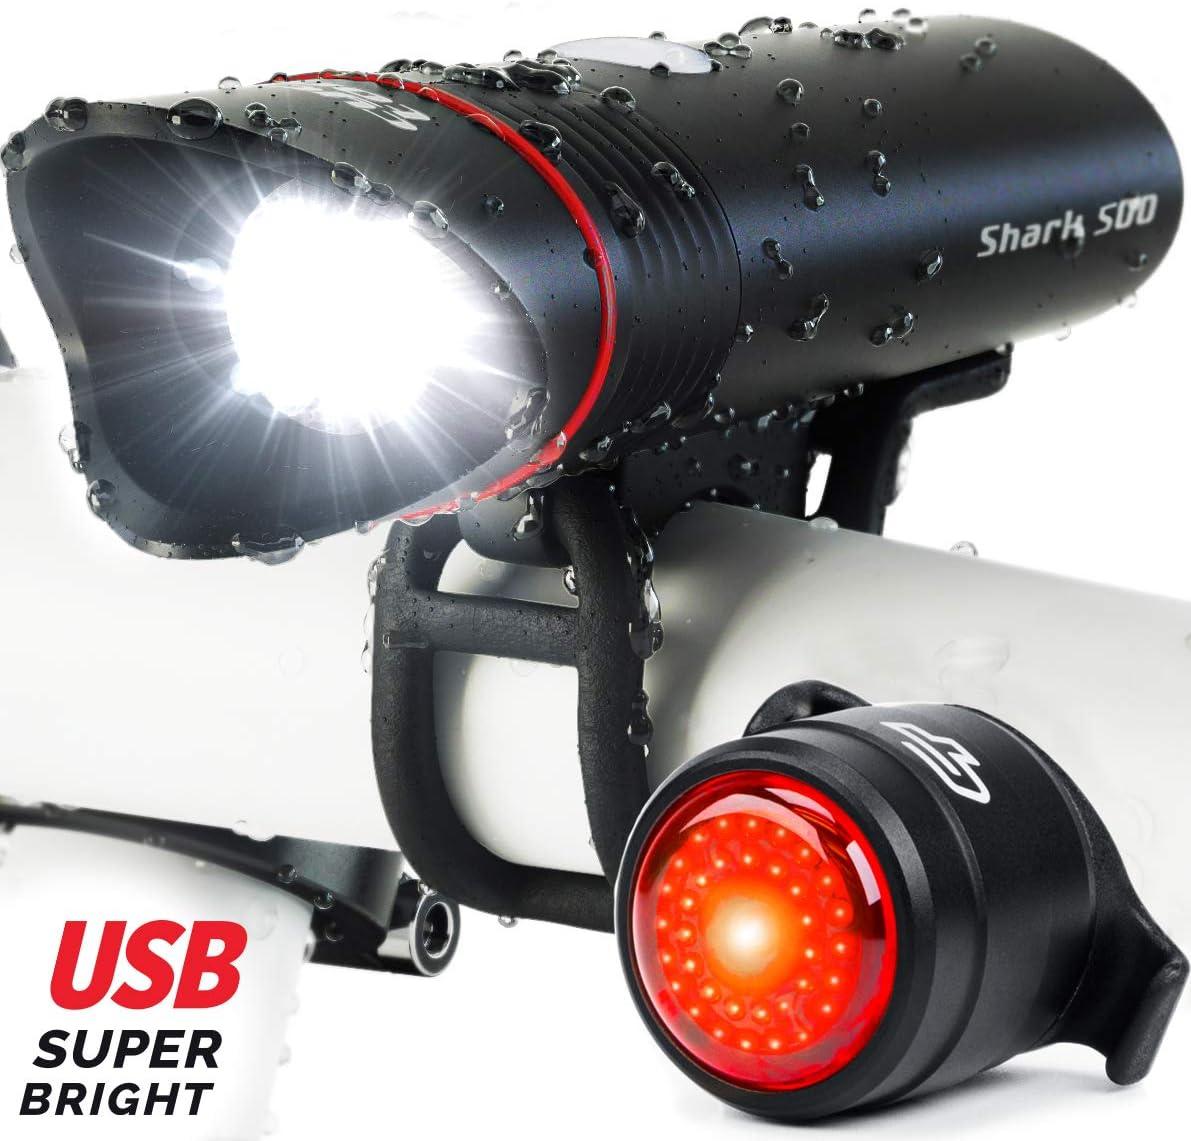 Cycle Torch Shark Bike Light